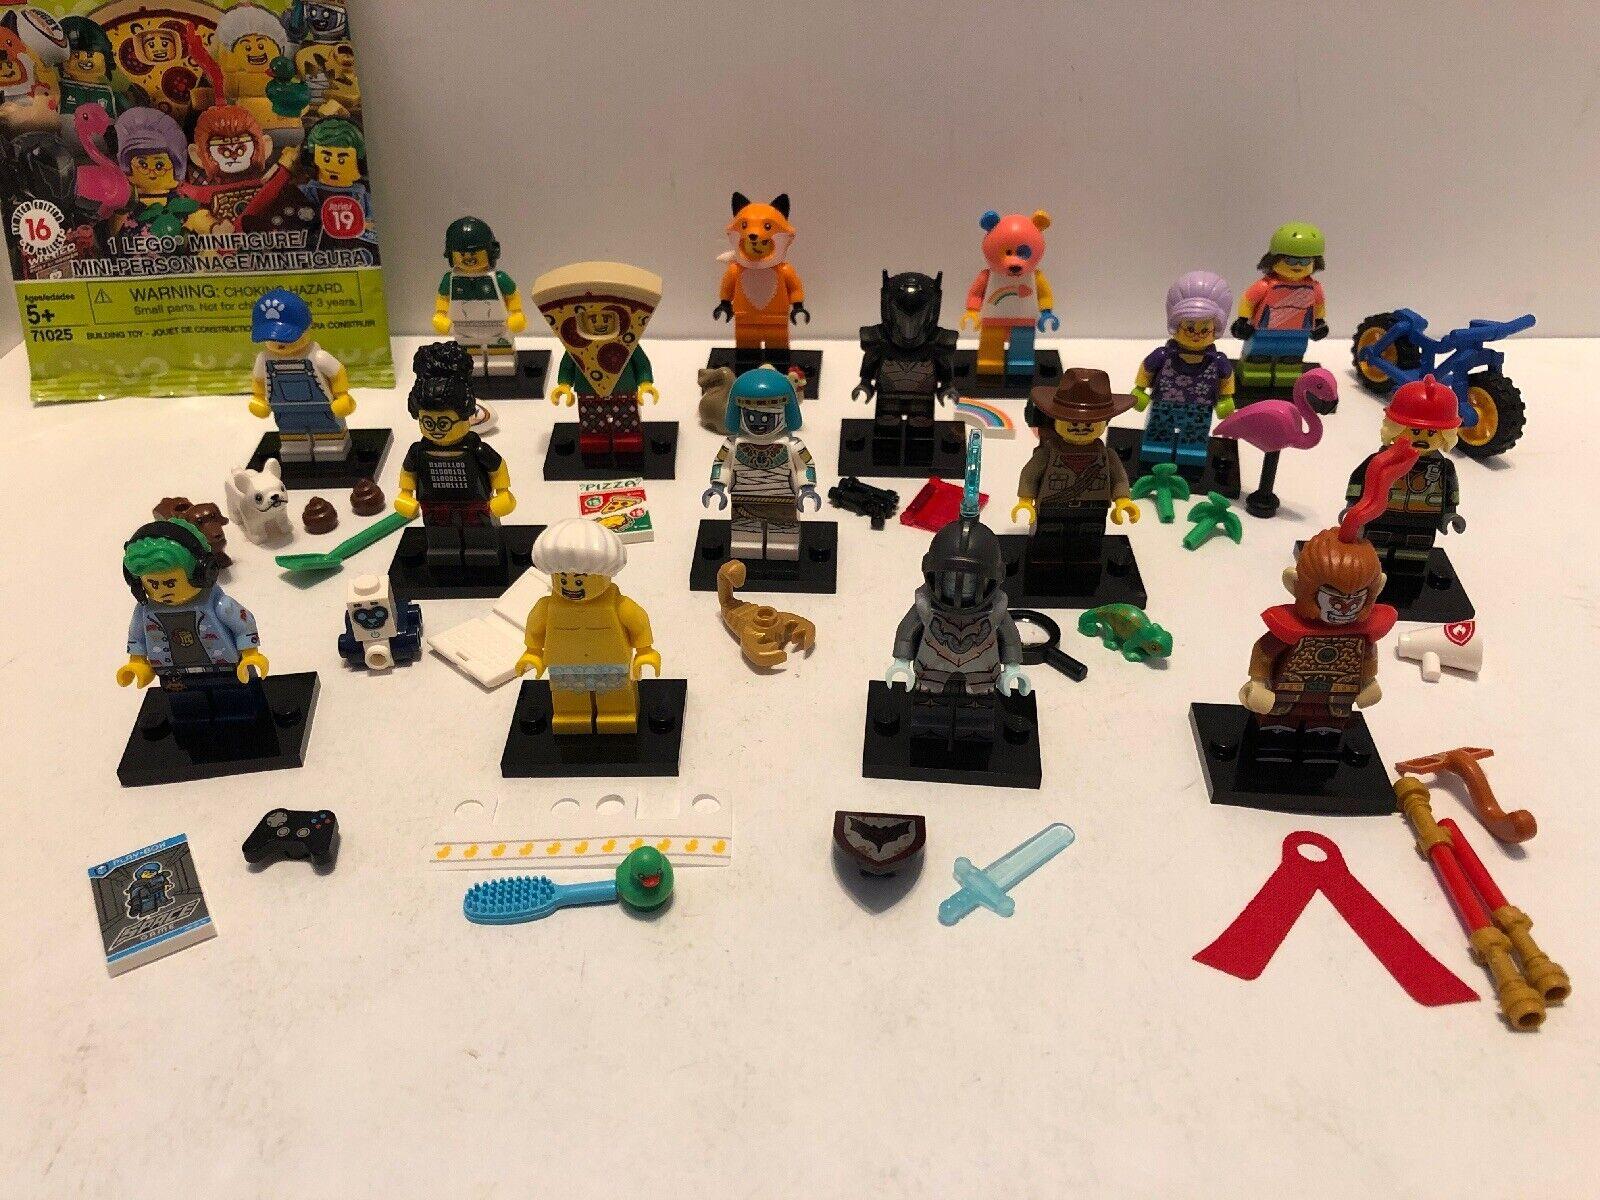 Lego Minifigura Serie 19 71025 juego completo de 16 Cocheacteres, abierto para ver las fotos